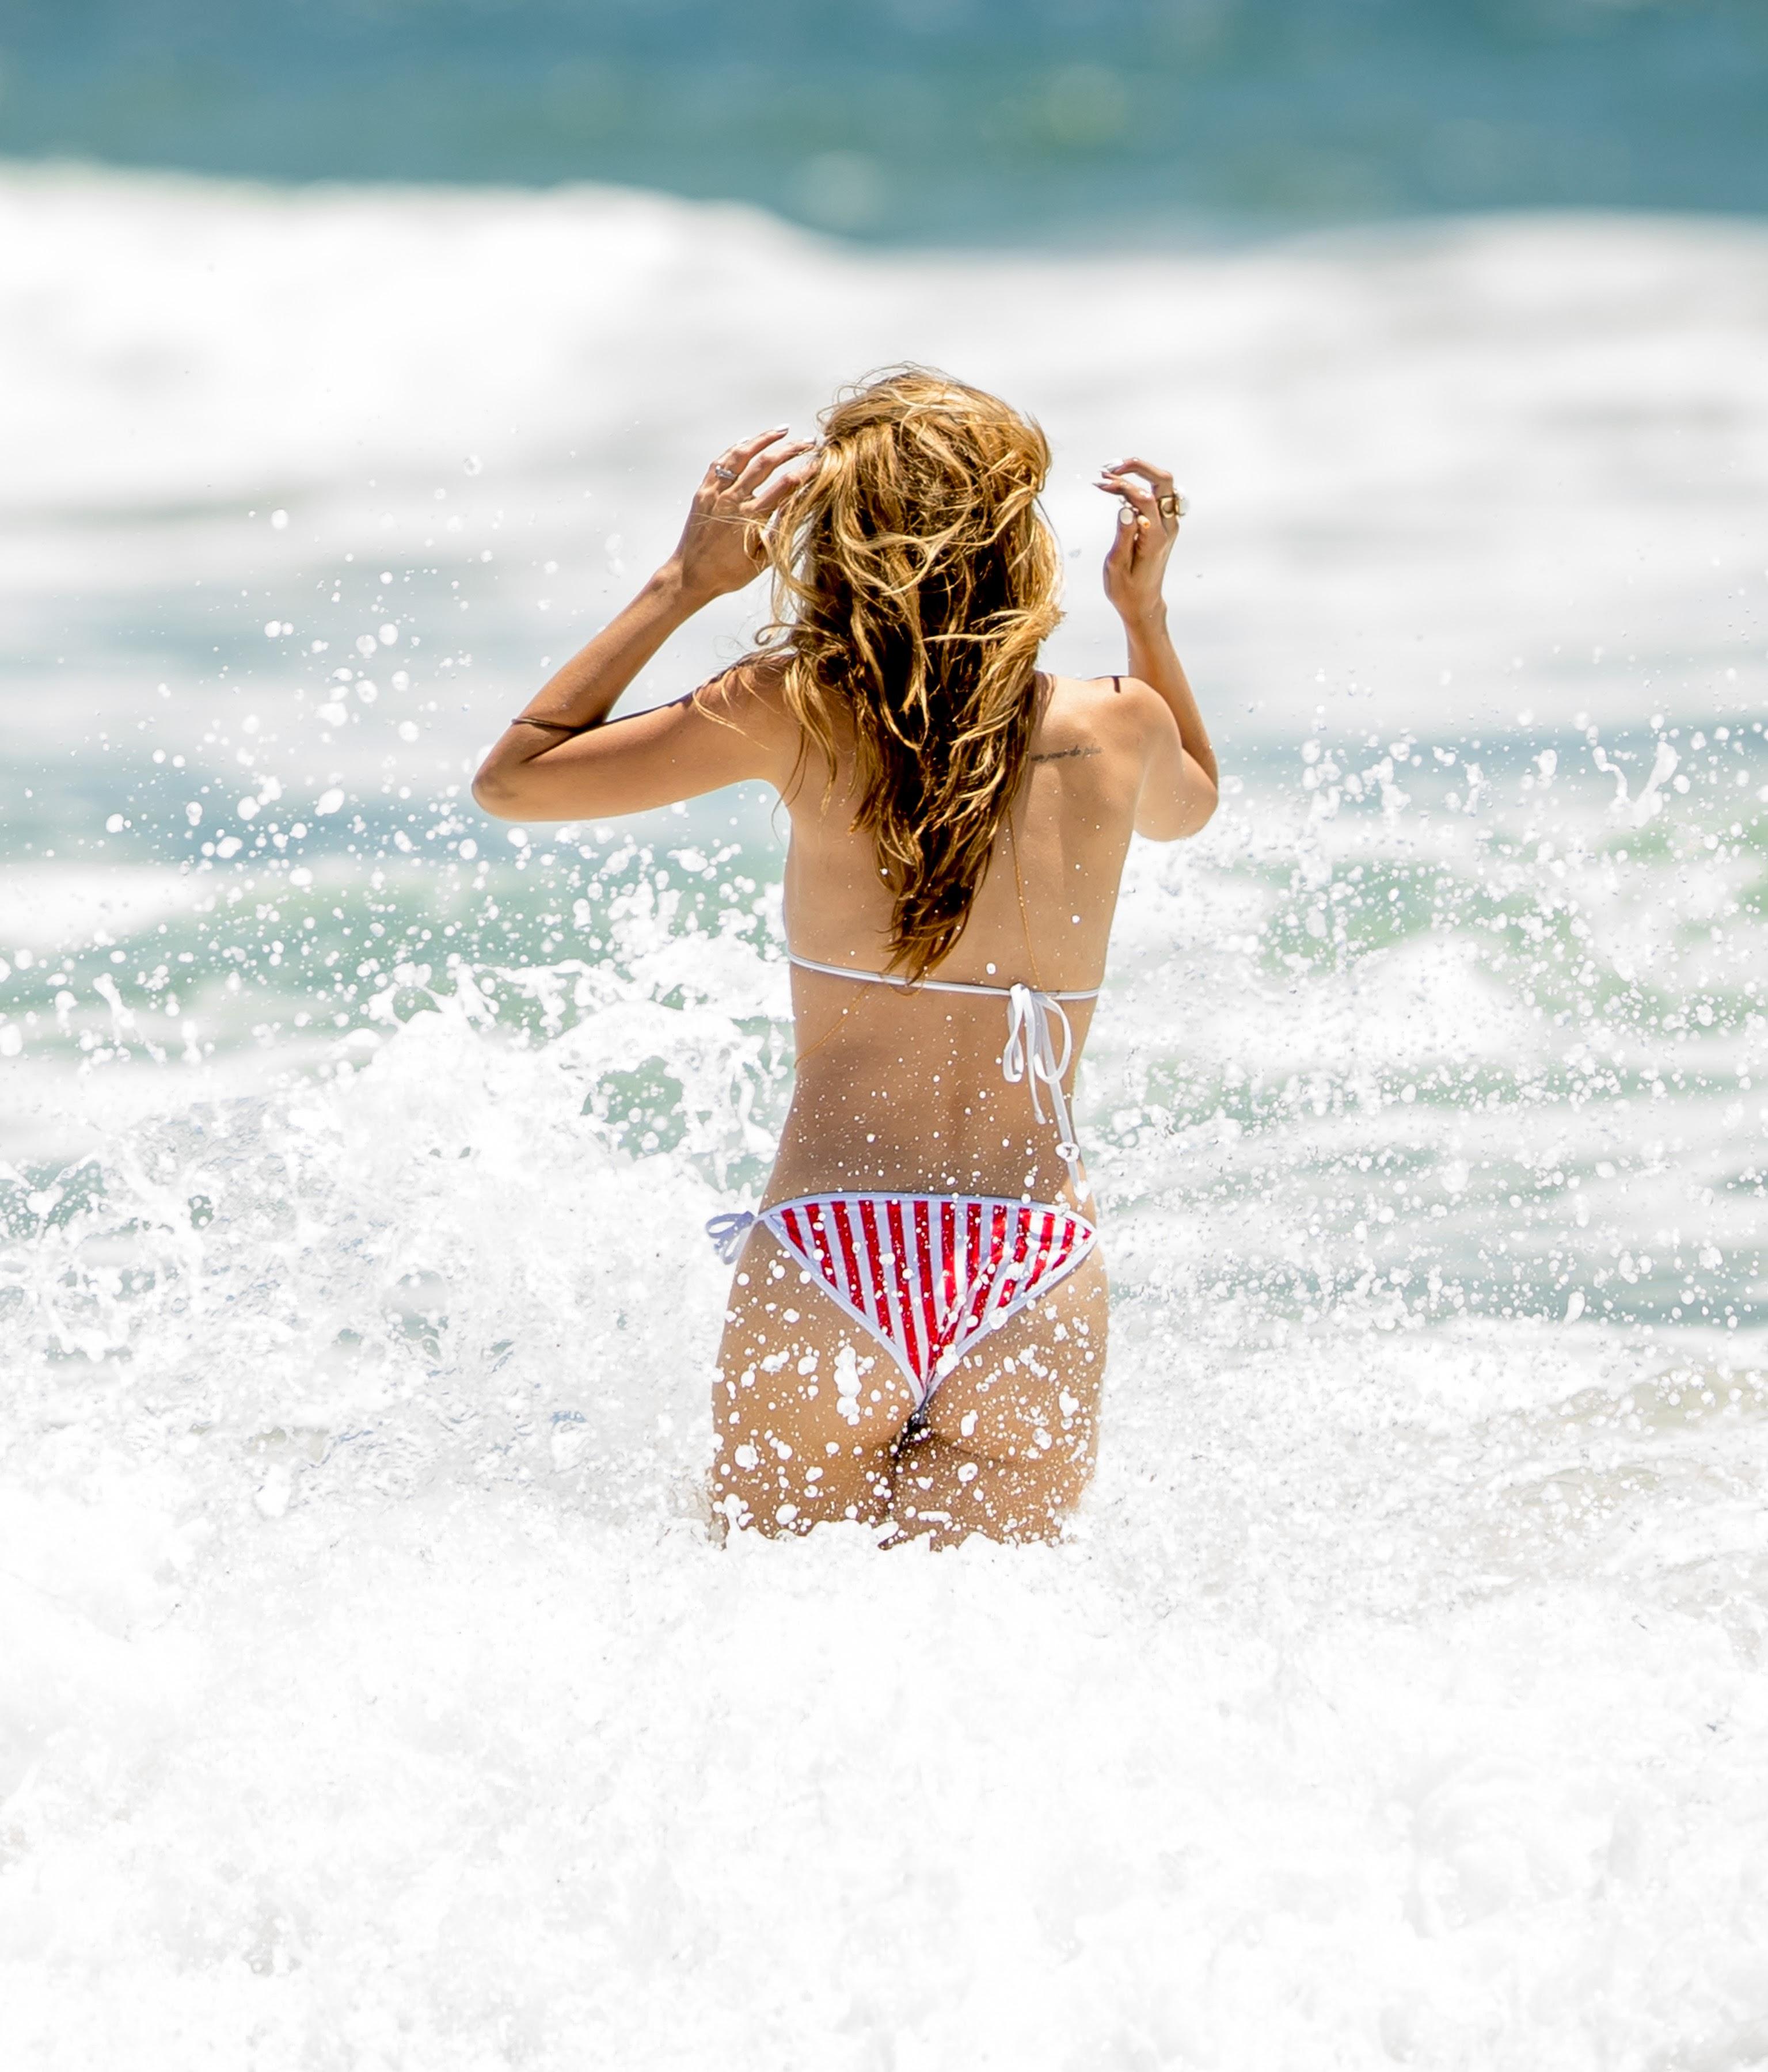 fashion blog rachel mccord bikini candids in venice beach. Black Bedroom Furniture Sets. Home Design Ideas